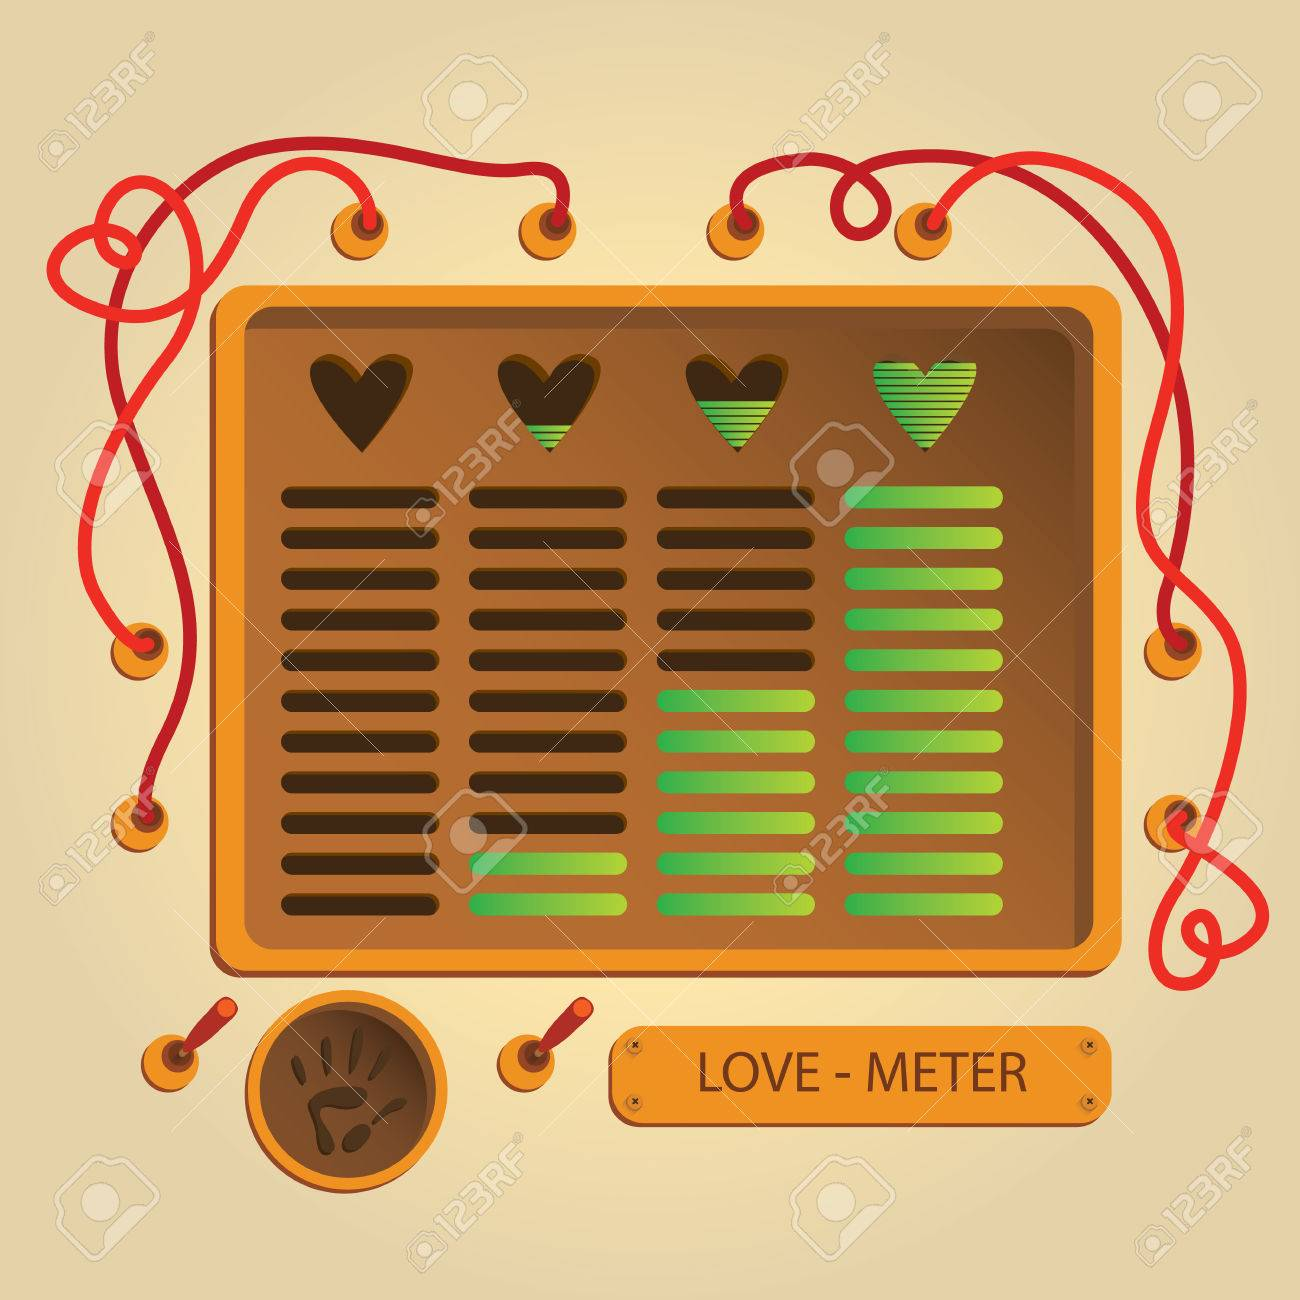 Love meter mashine. card for Valentine's day - 72281133